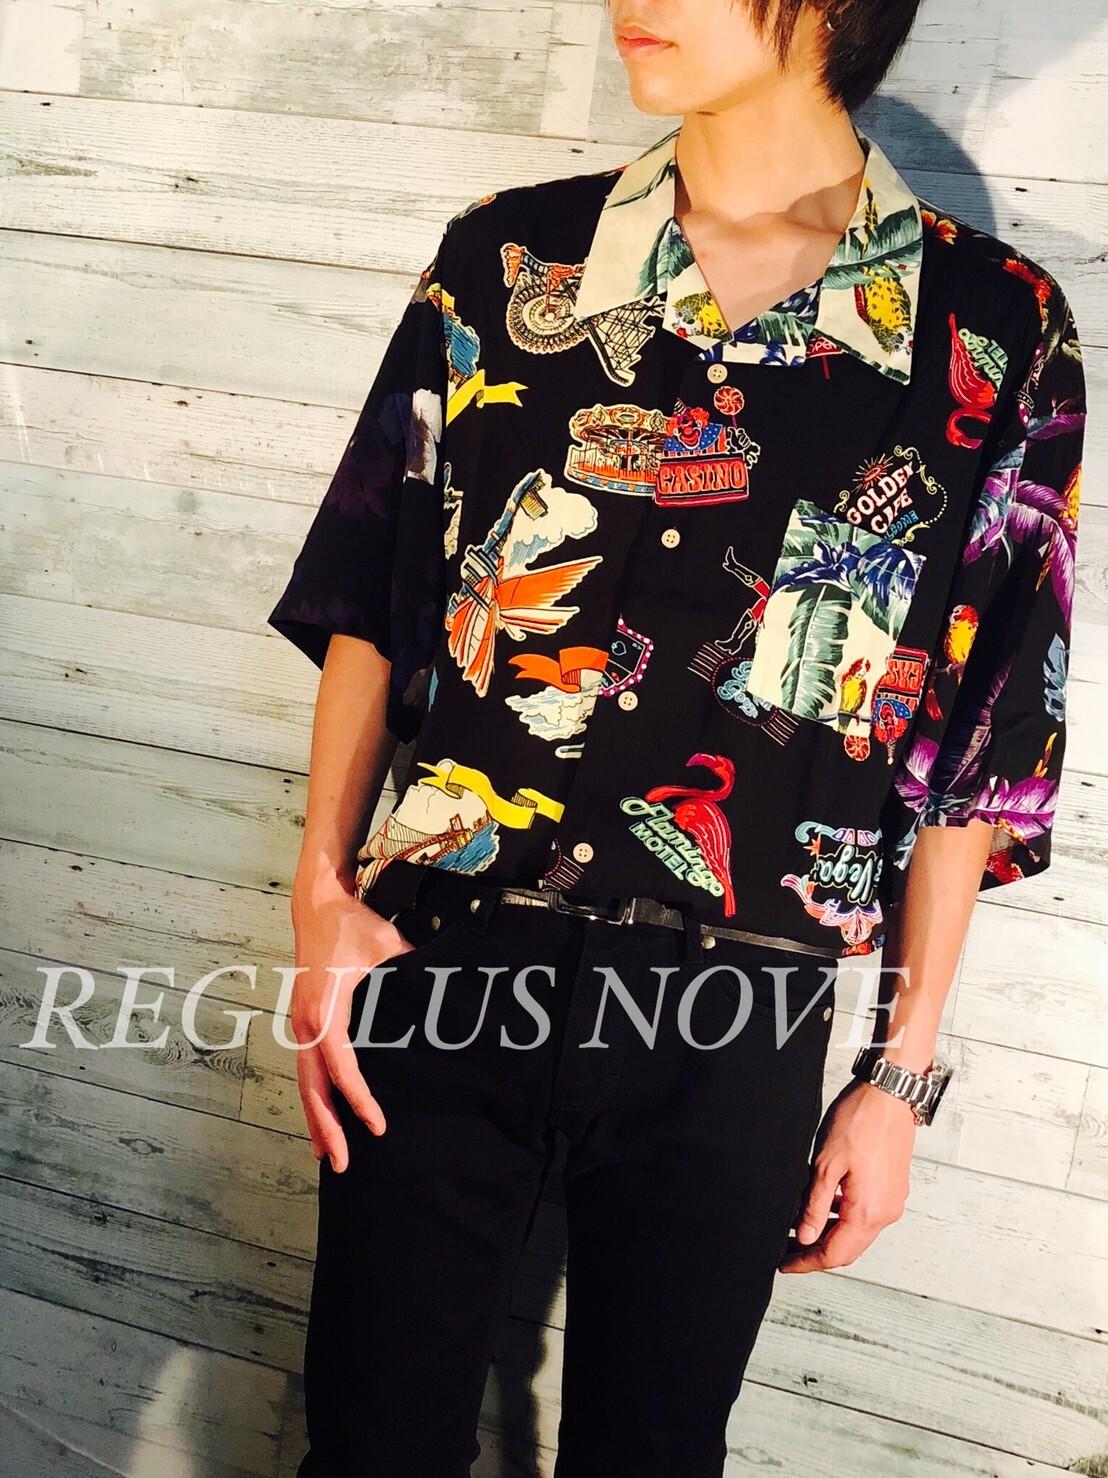 REGULUS NOVE BIGシルエットオープンカラーアロハシャツ CRAZY ユニセックス レディース メンズ オーバーサイズ 大きいサイズ 派手 個性的 開襟シャツ トレンド